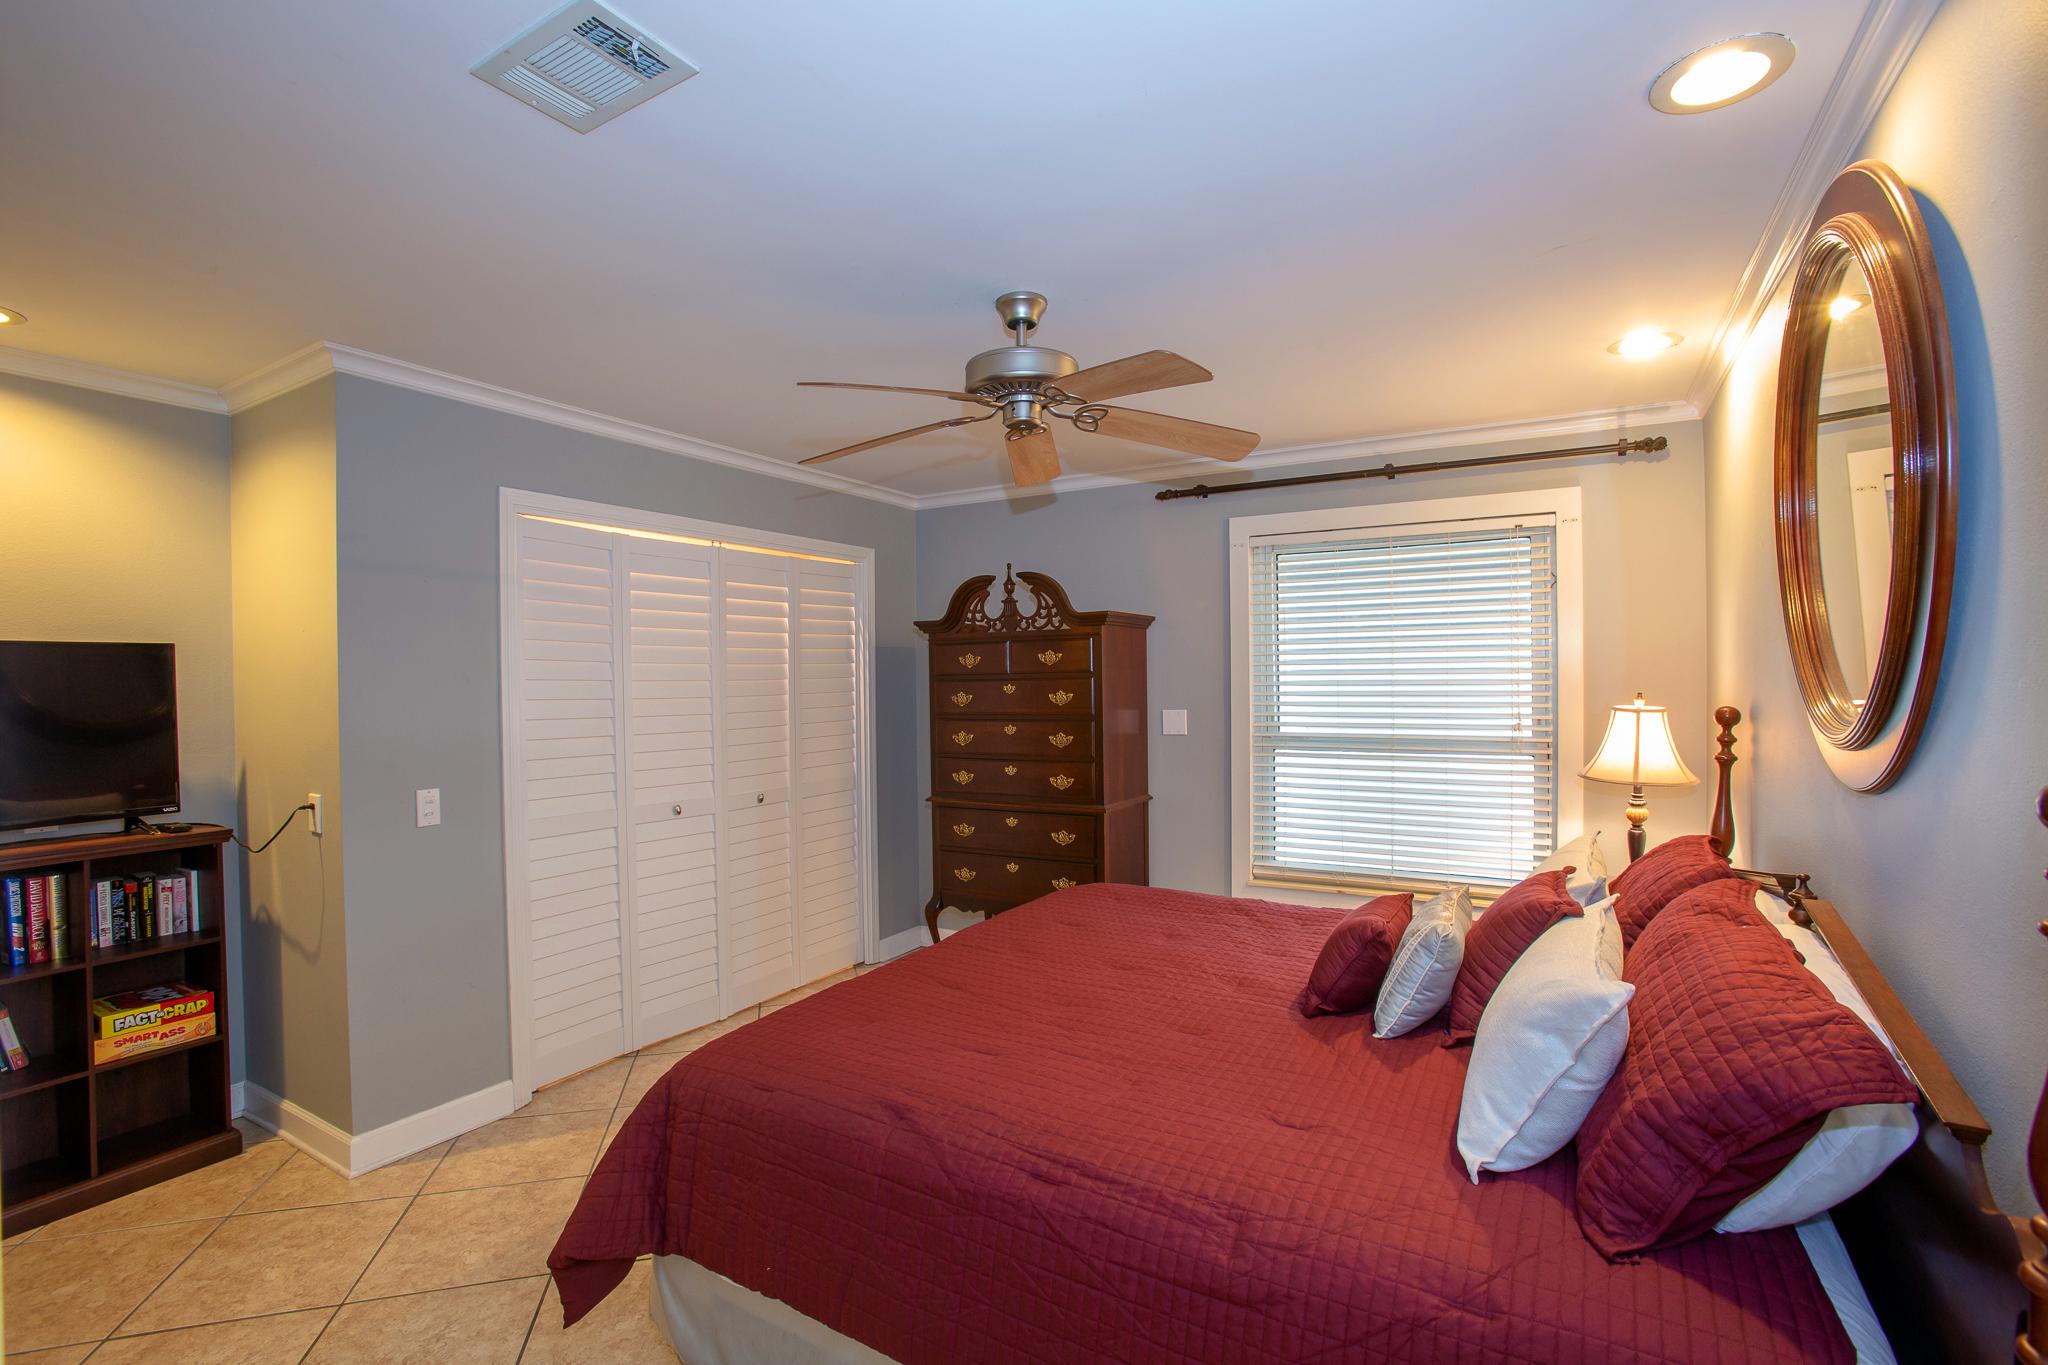 Maldonado 1015 - Sea the Big Picture House/Cottage rental in Pensacola Beach House Rentals in Pensacola Beach Florida - #11